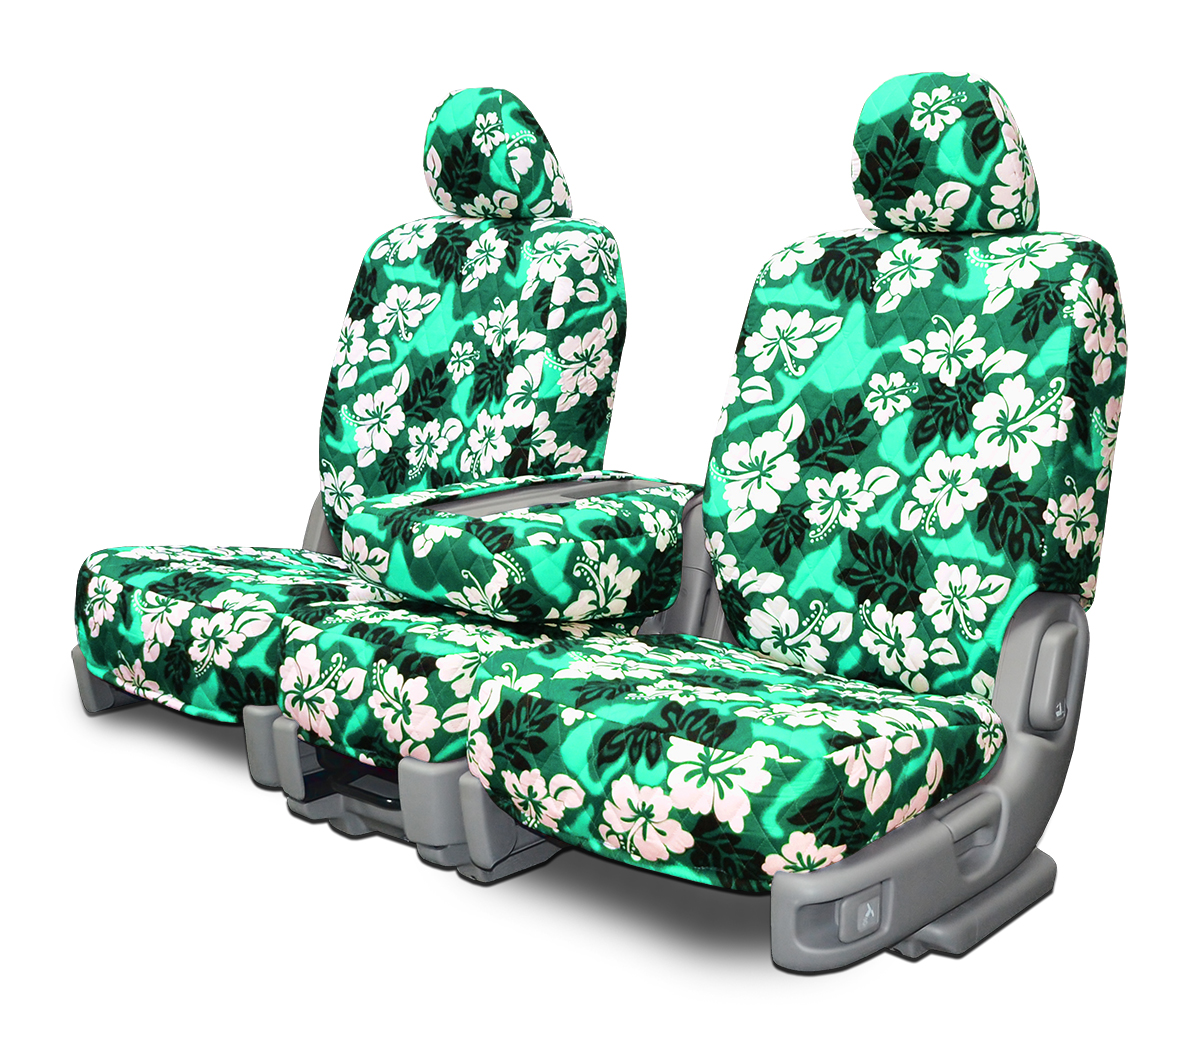 Hawaiian Car Seat Covers >> Hawaiian Seat Covers Seat Covers Unlimited